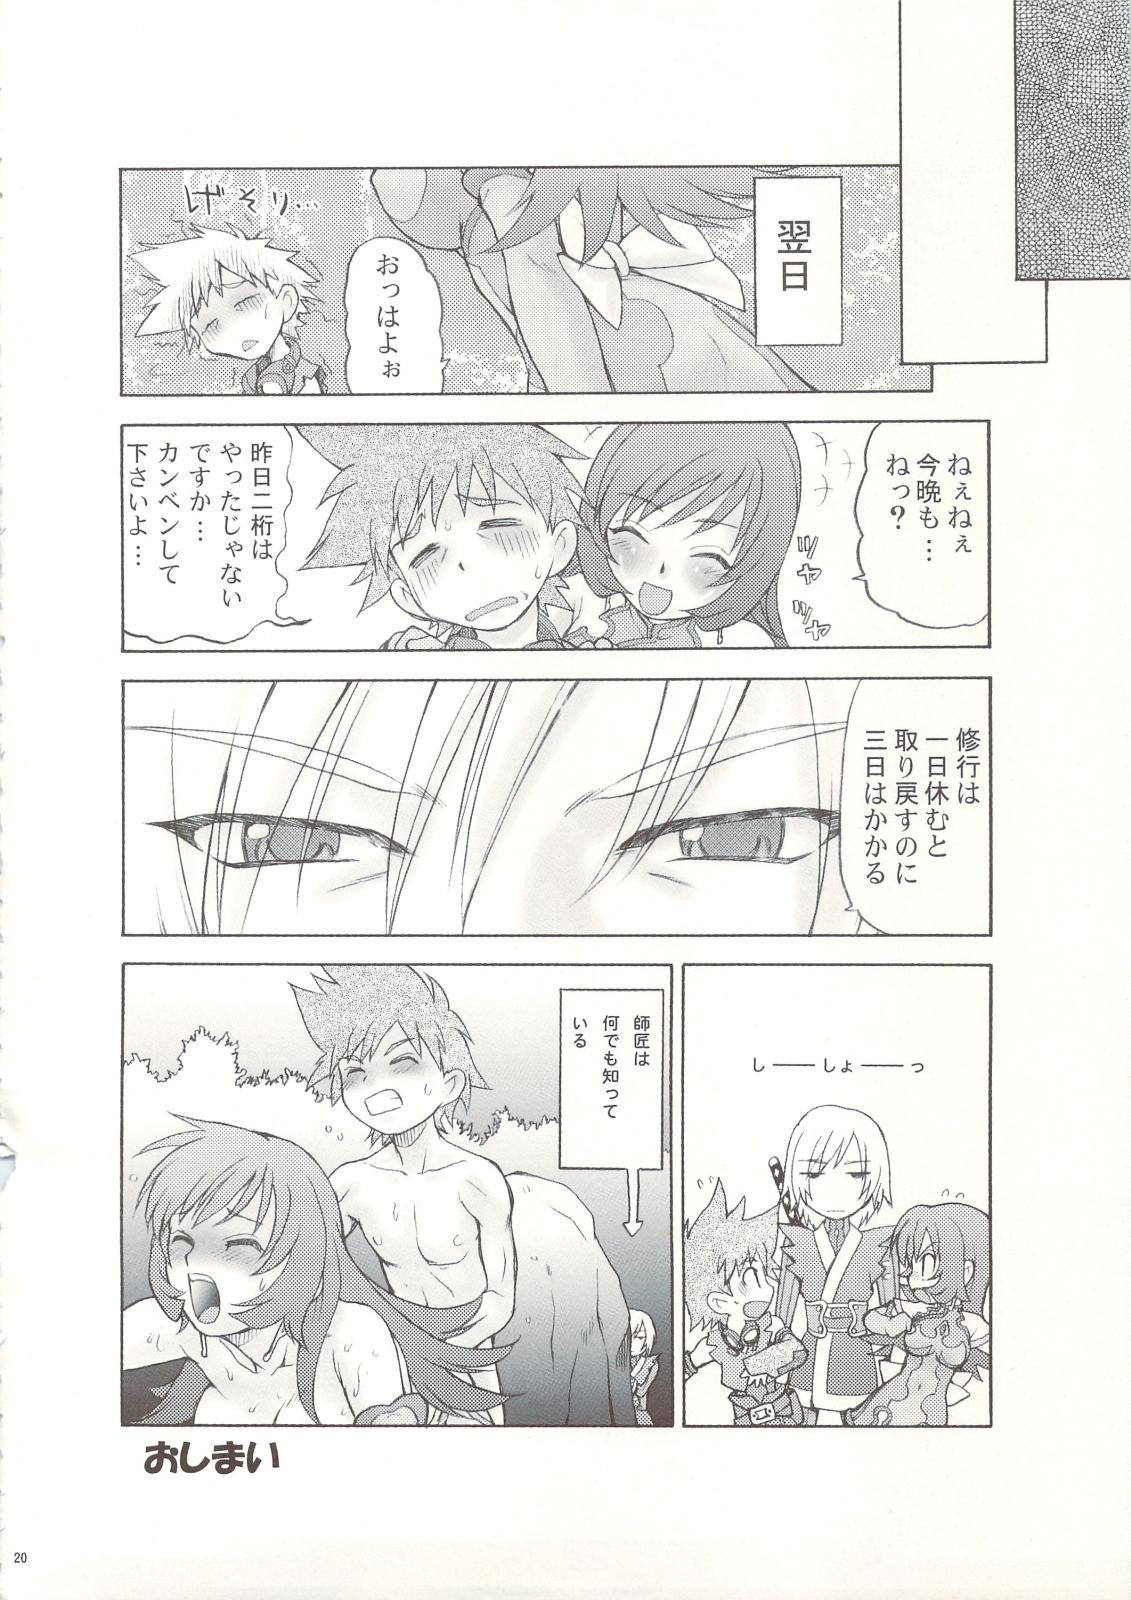 Anemono Hitomatome Plus Soushuuhen 3 18